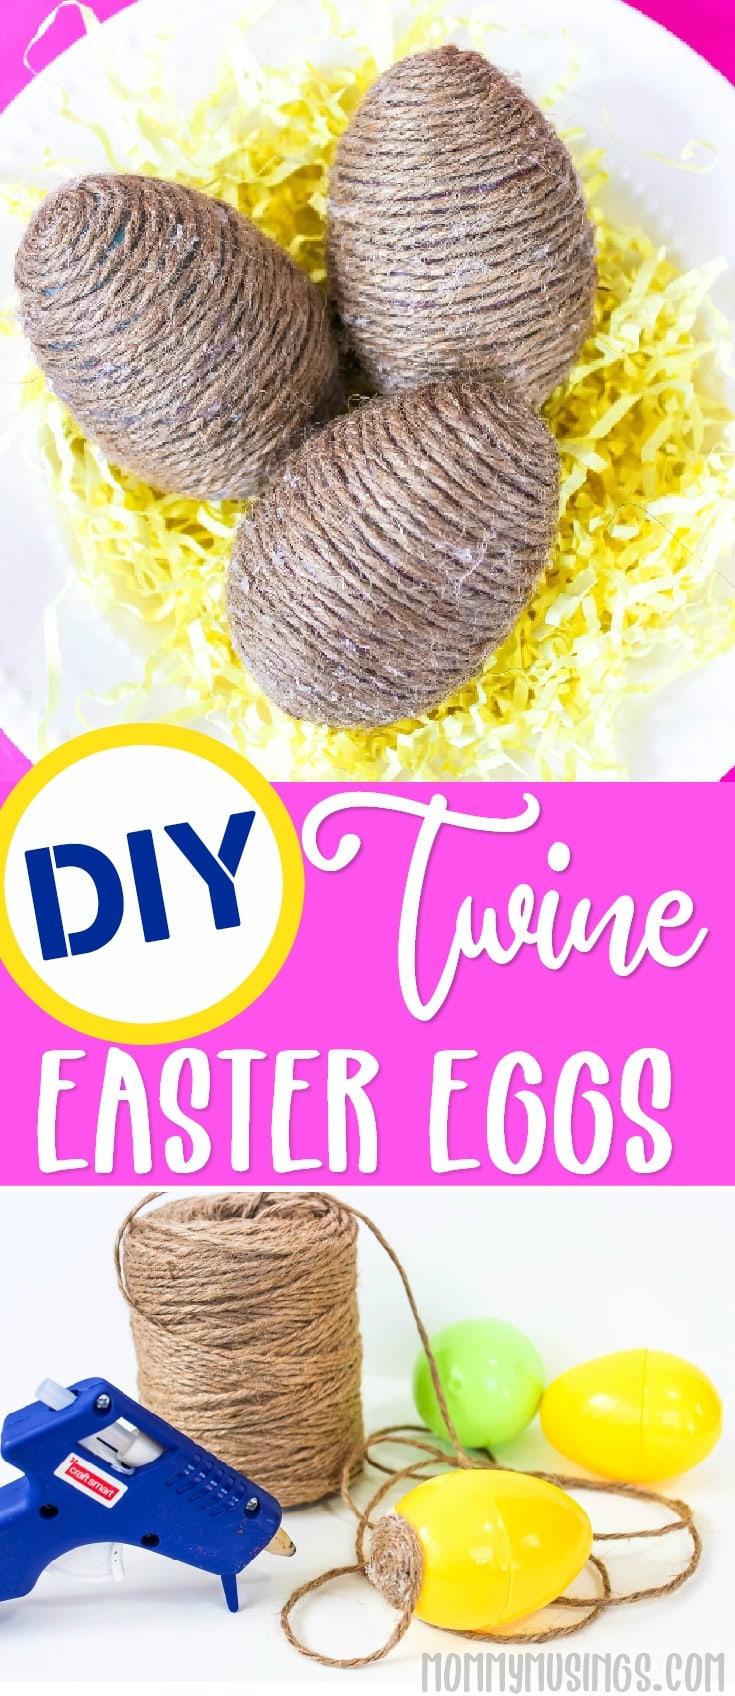 EASY DIY TWINE EASTER EGGS CRAFT